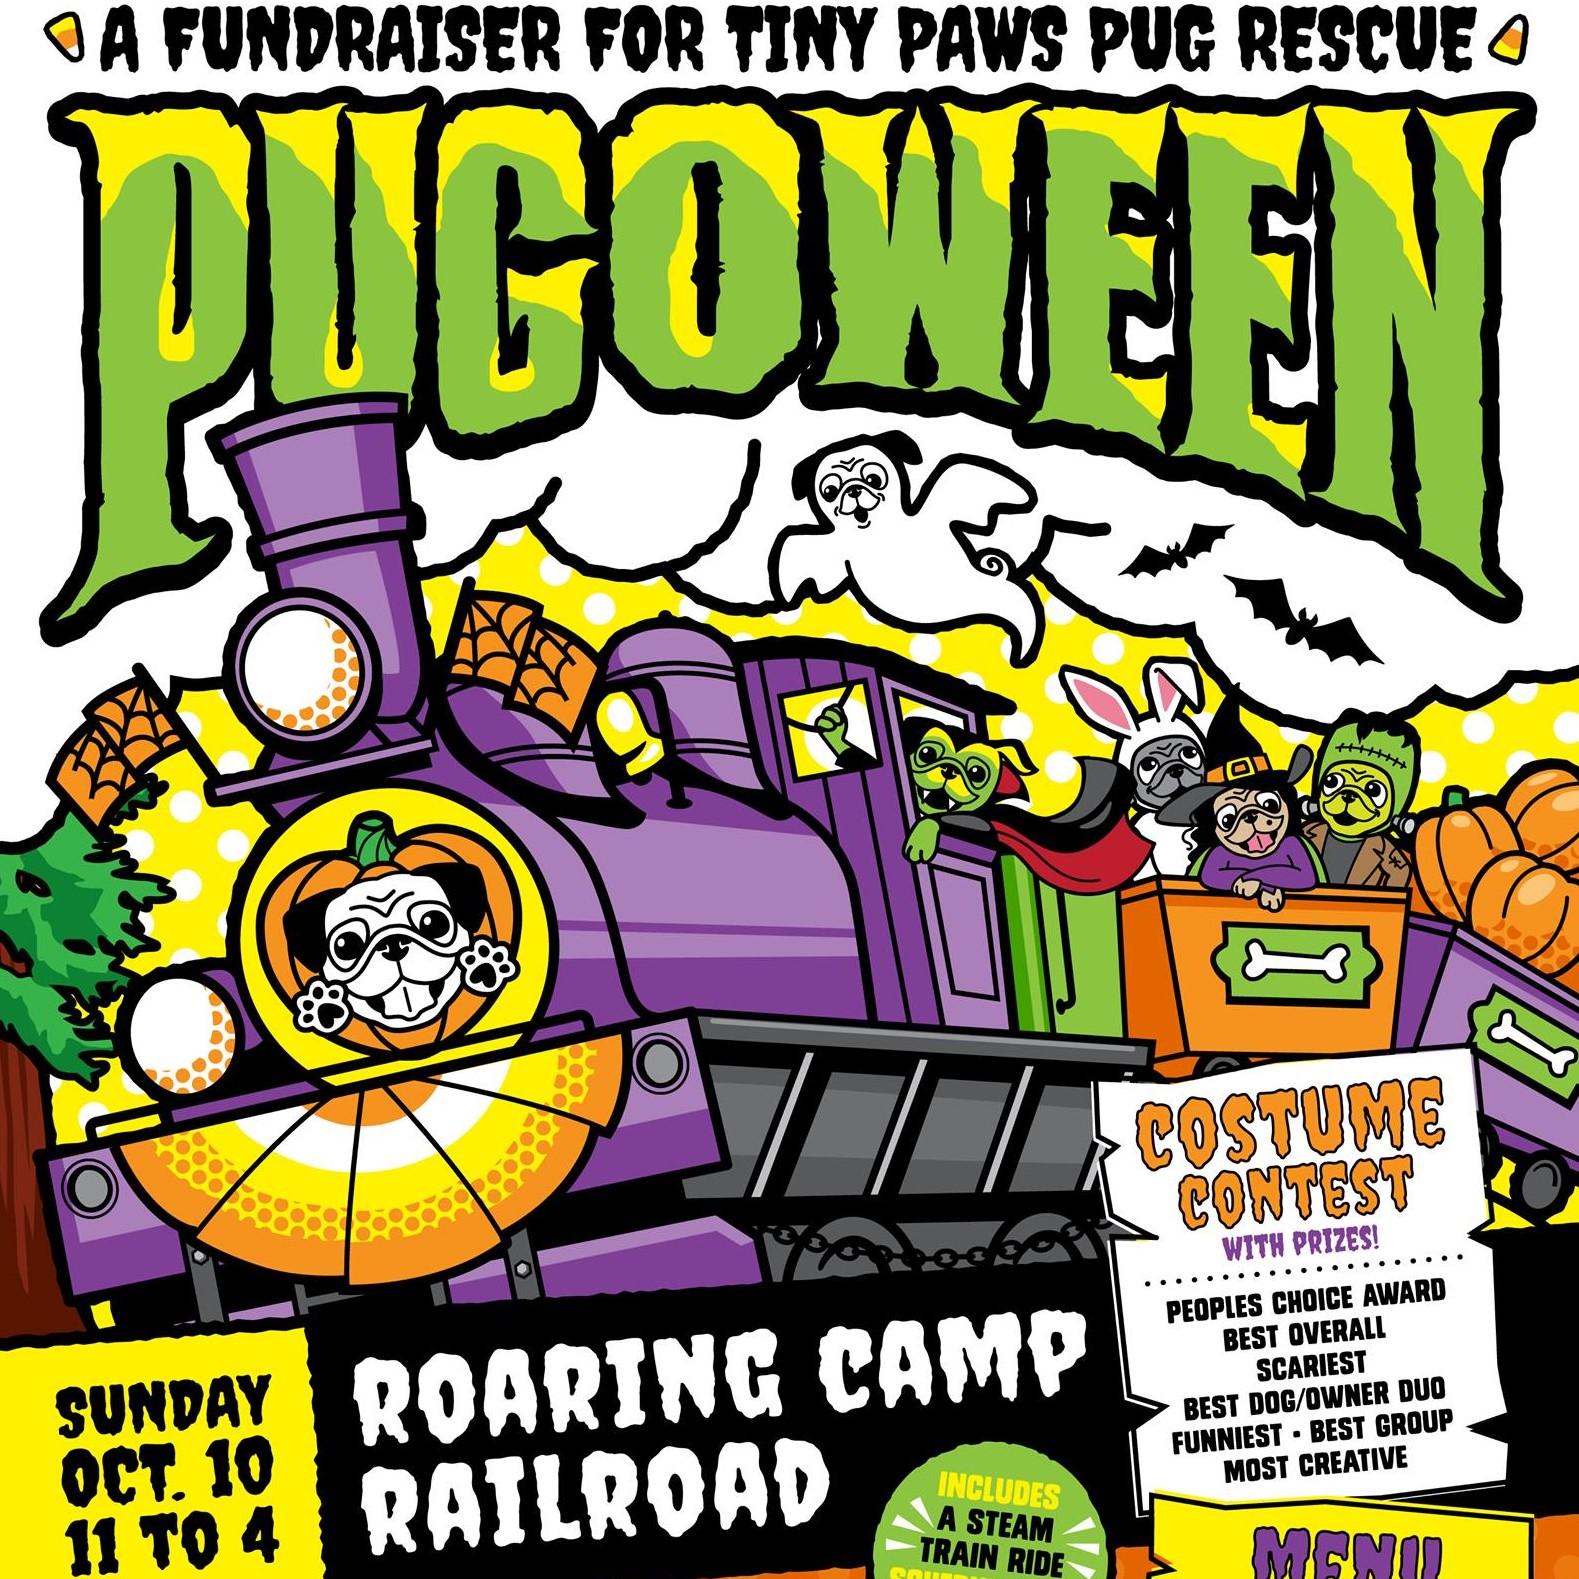 Pug O Ween Dog Costume Halloween event